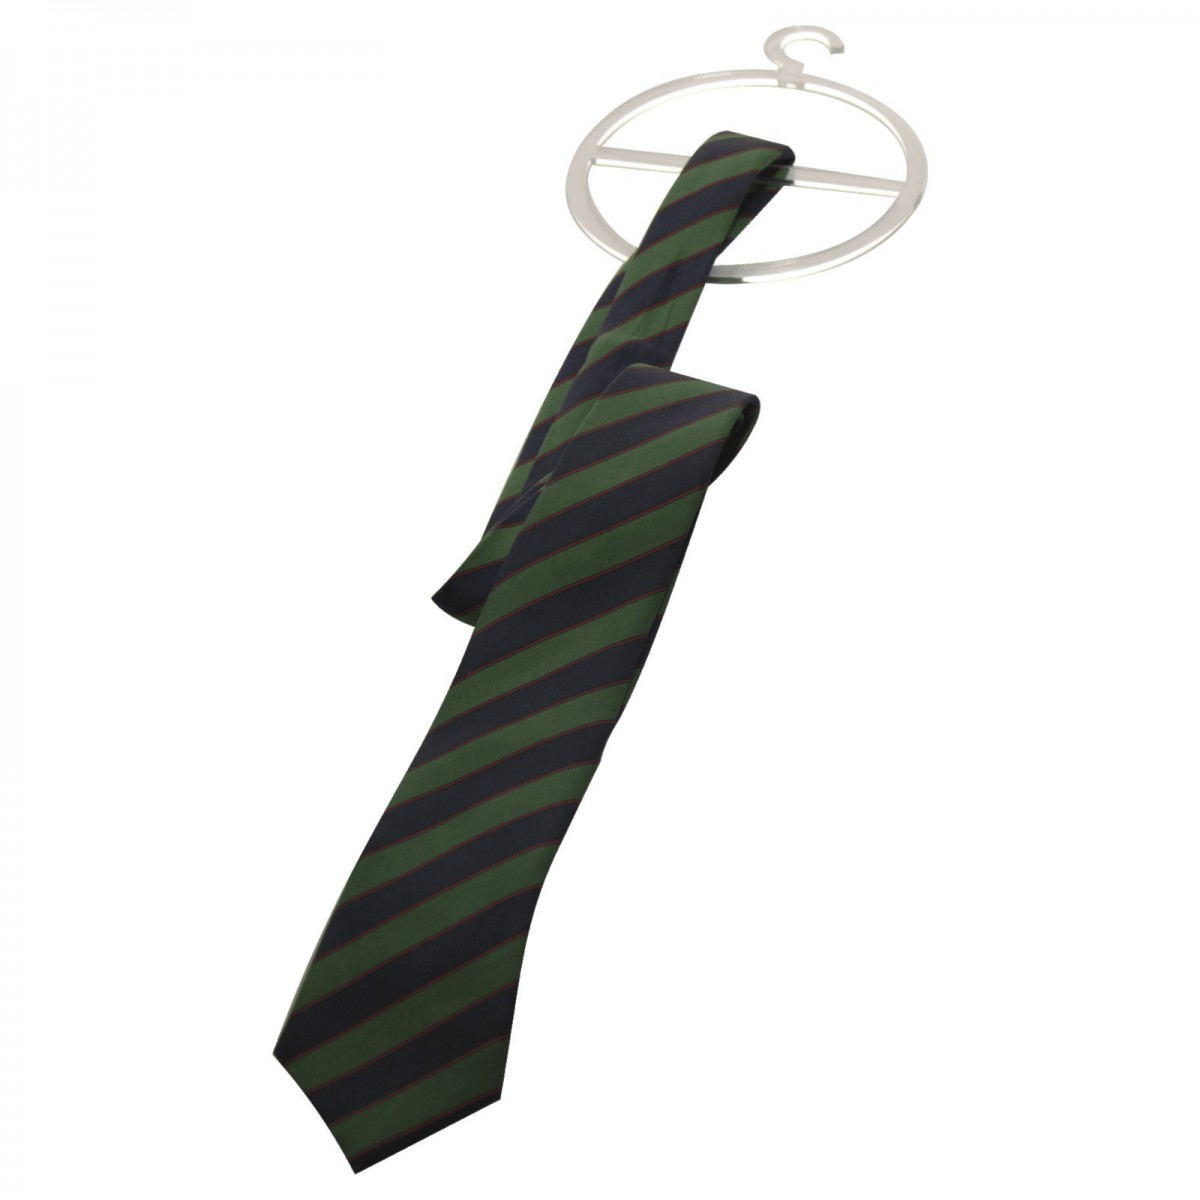 E-303 EPC-C - Porta cravatte e foulard in plexiglass trasparente - Misure 13.5 x H17 cm